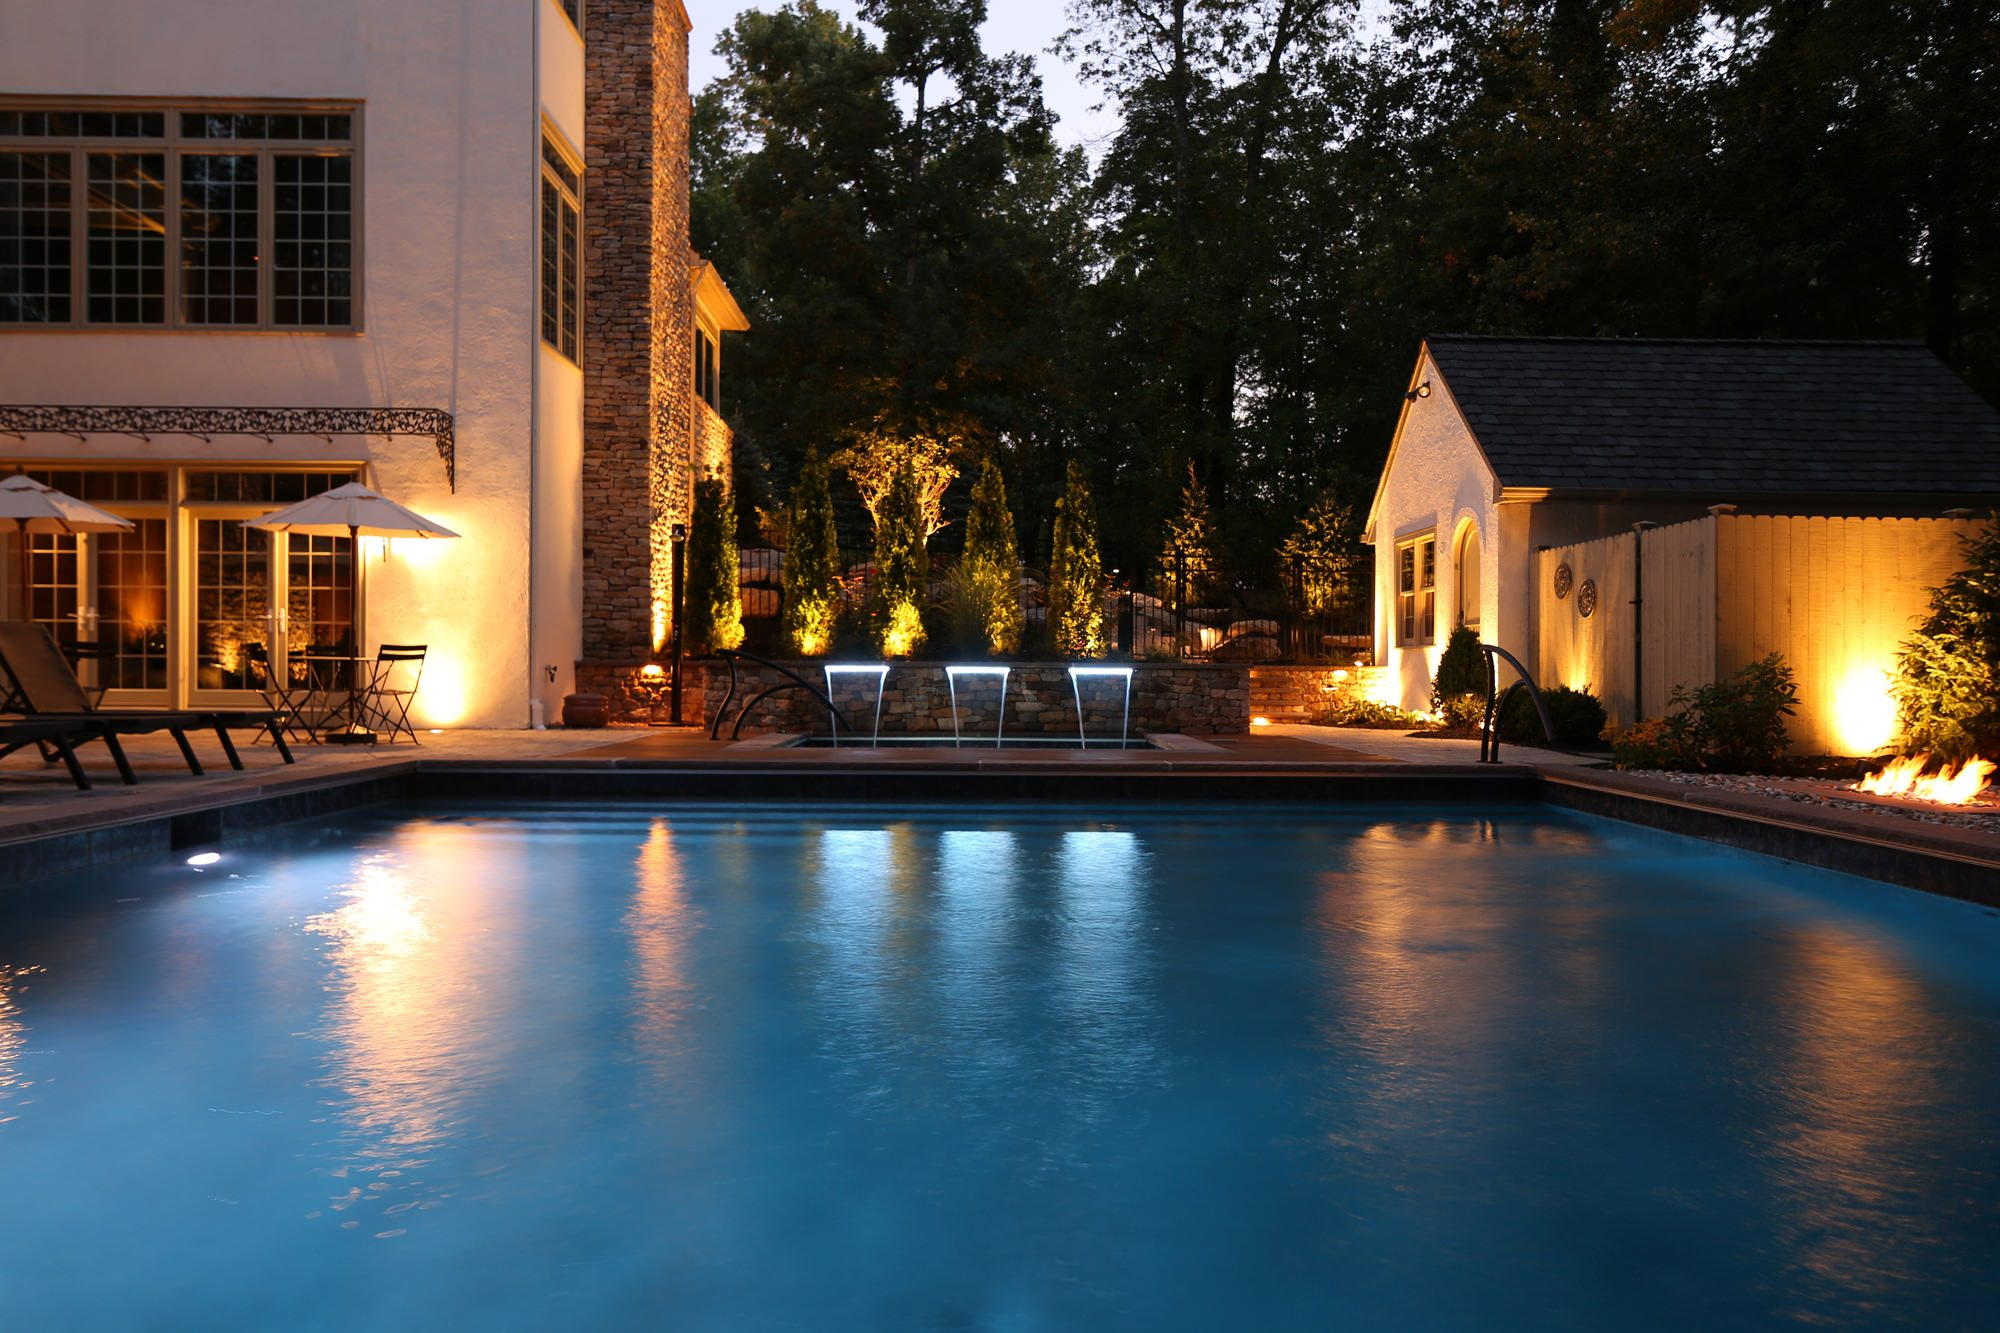 Fancy a night swim?